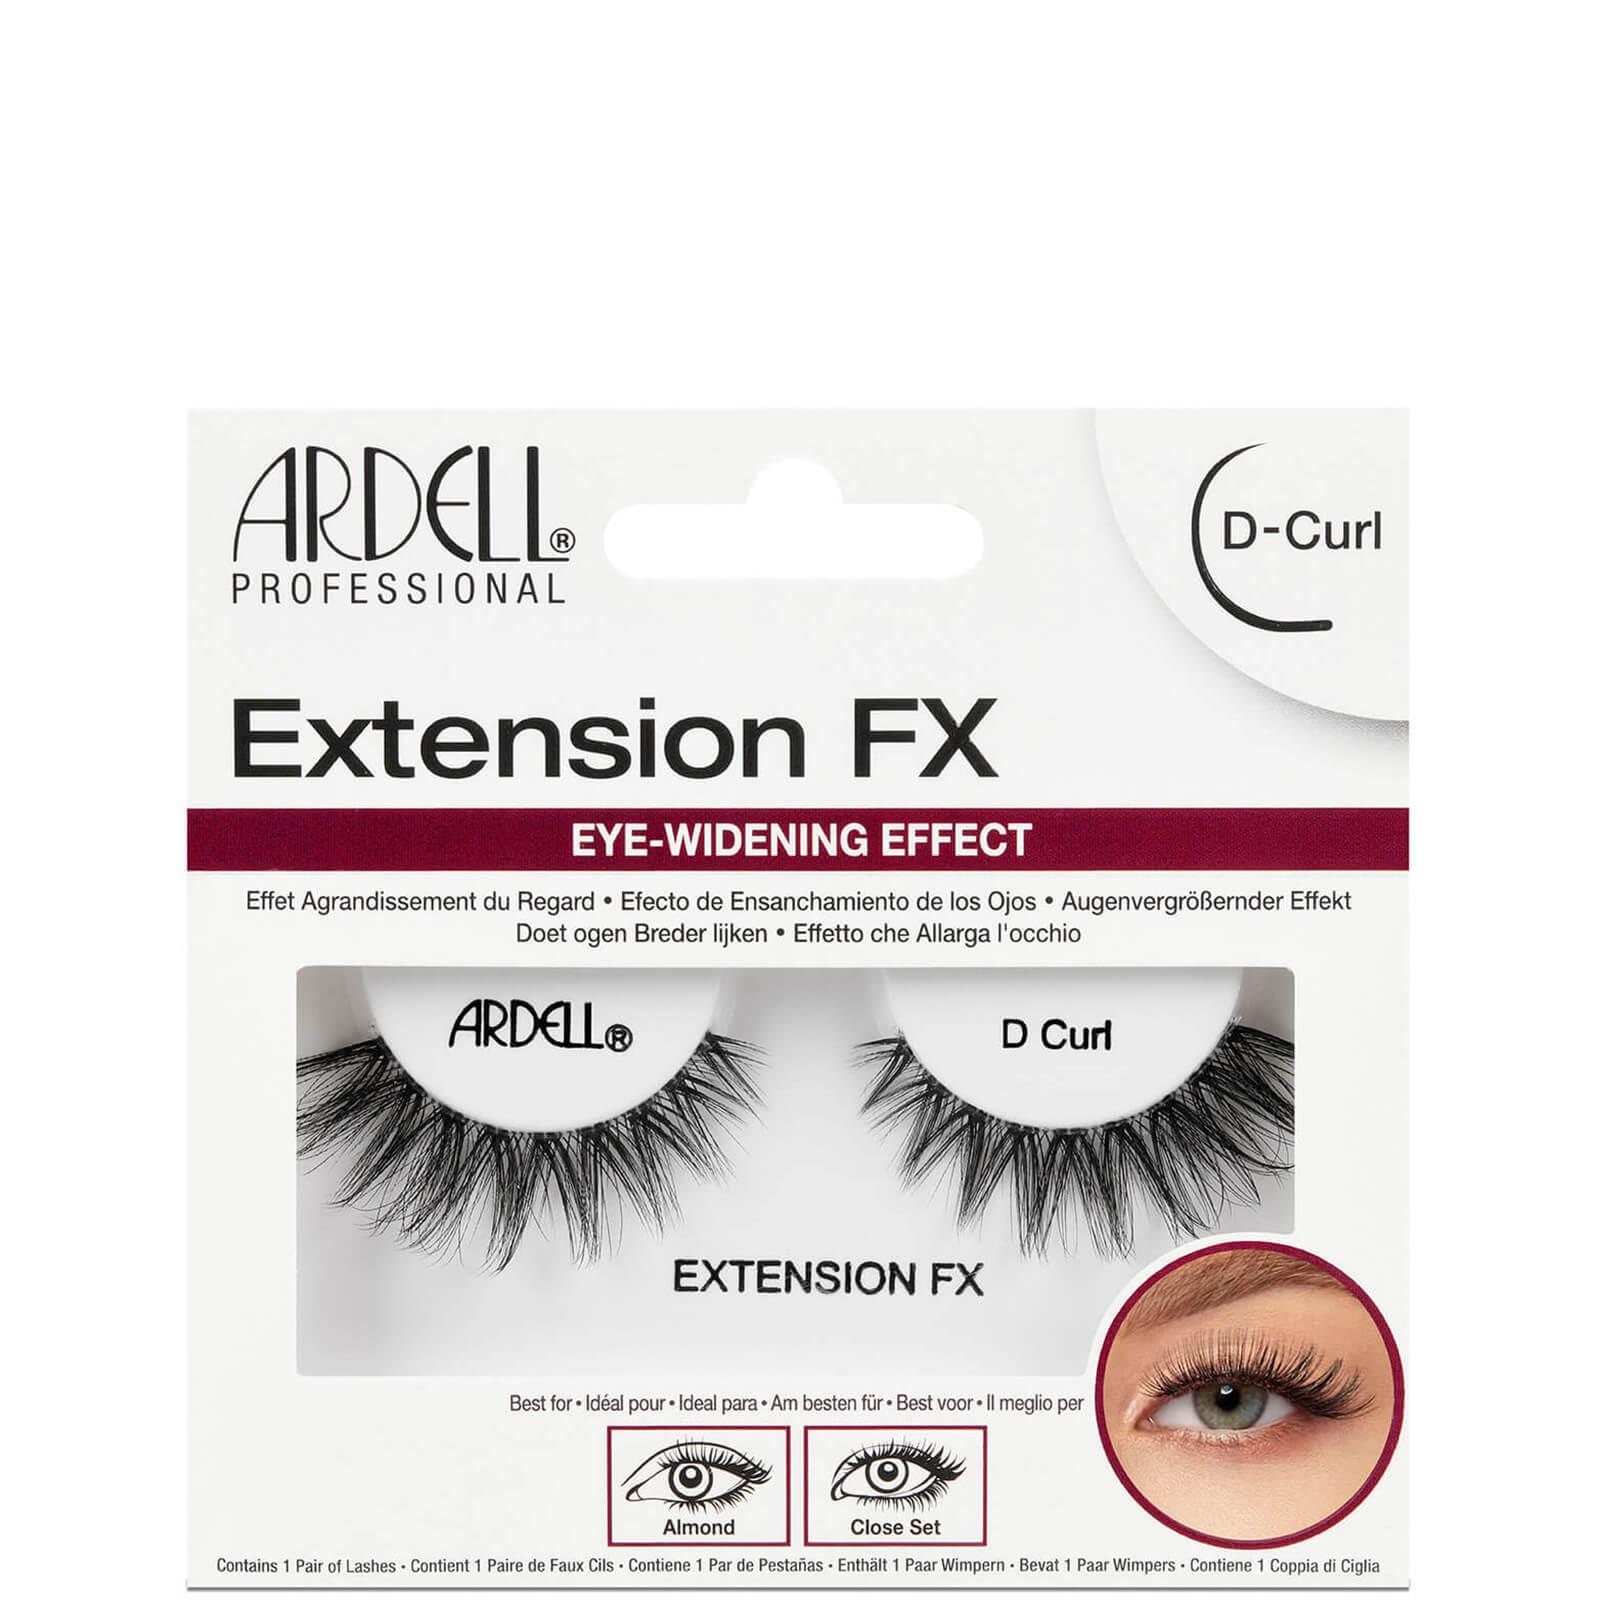 Купить Ardell Extension FX - D Curl